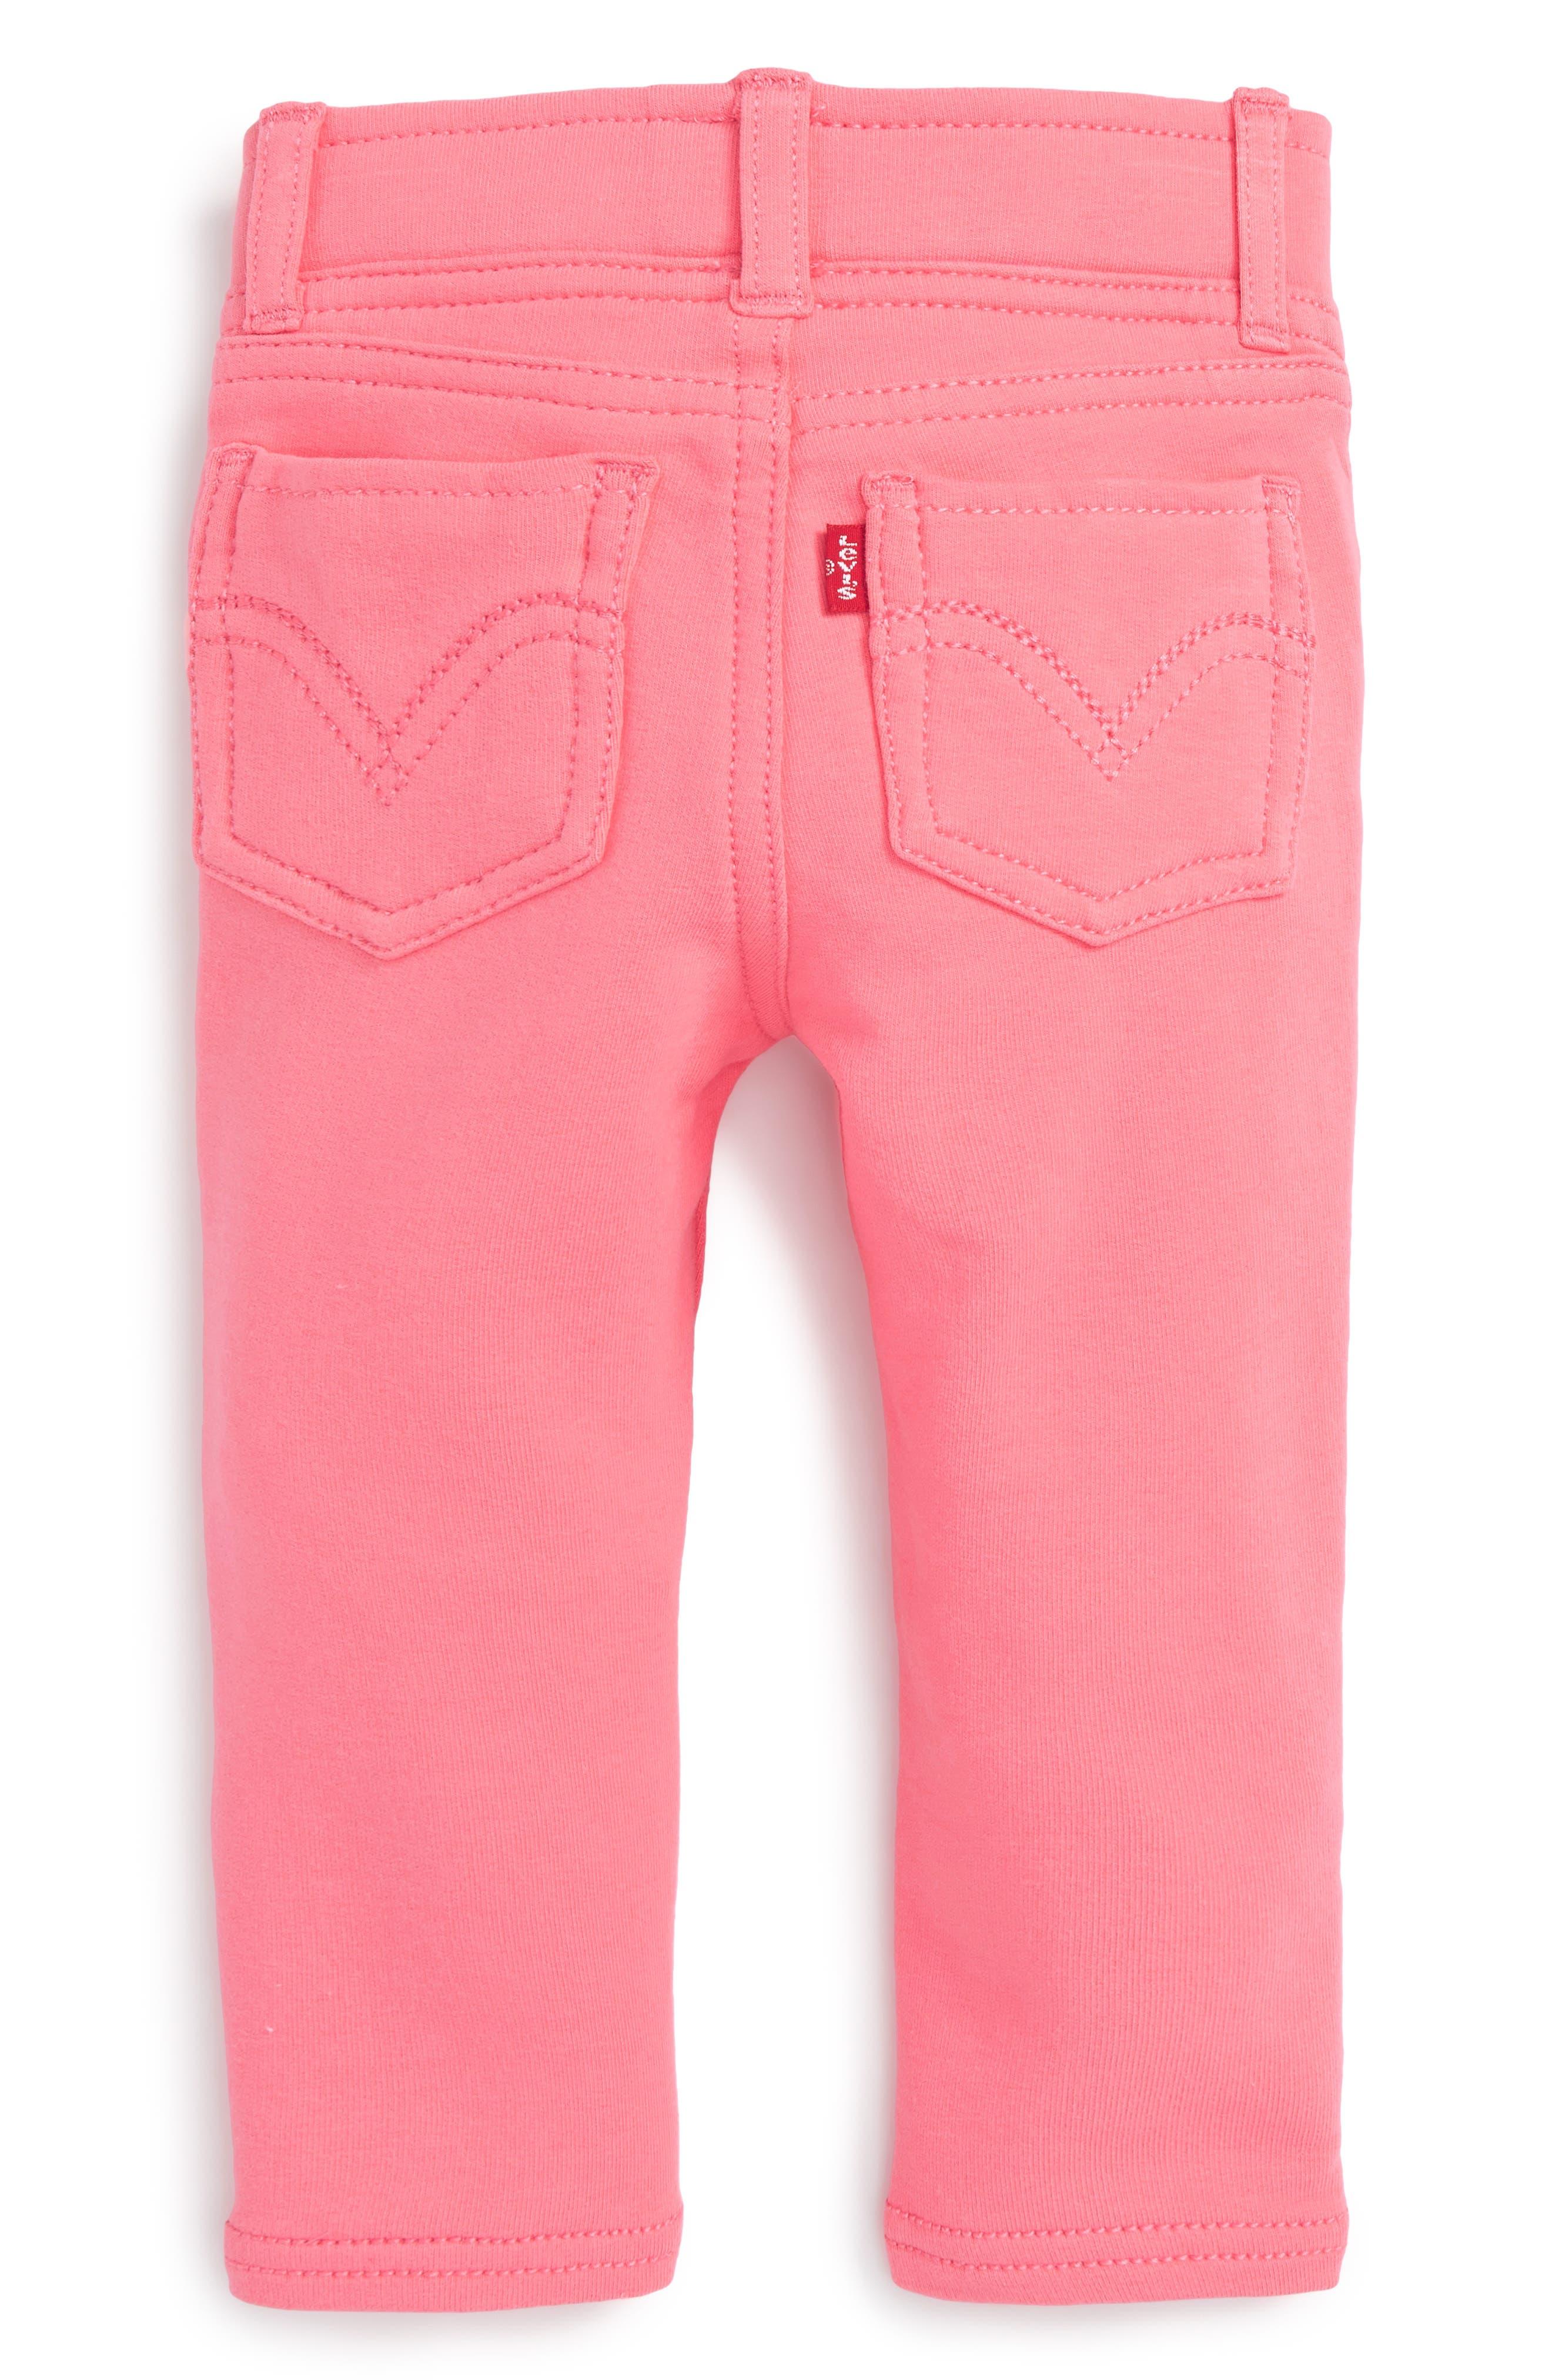 Haley May Leggings,                             Alternate thumbnail 2, color,                             Strawberry Pink